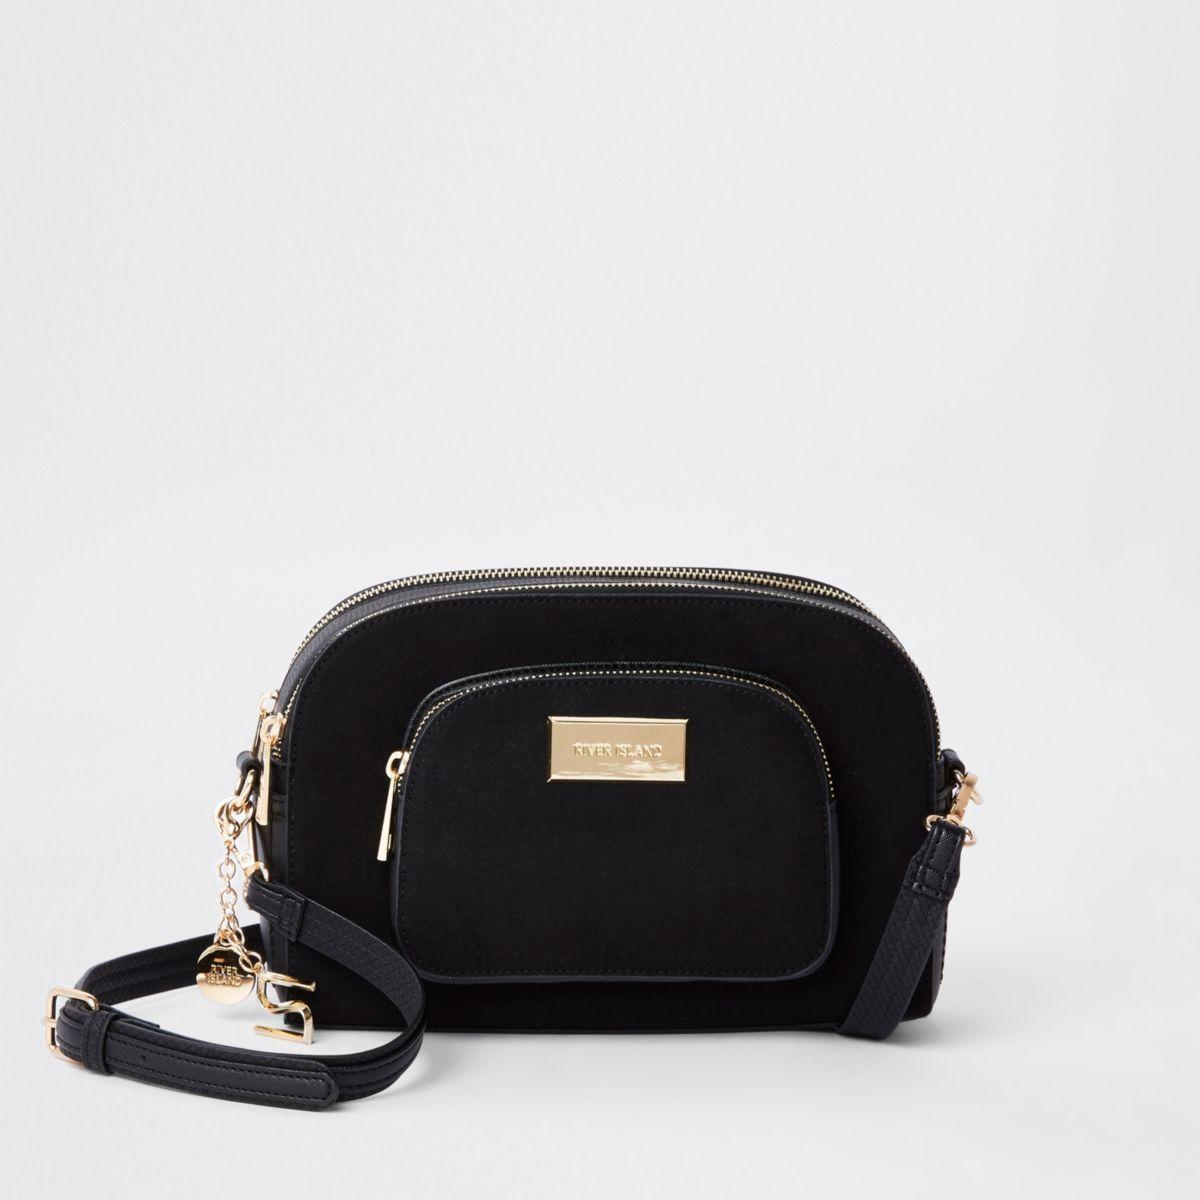 Black curved cross body bag